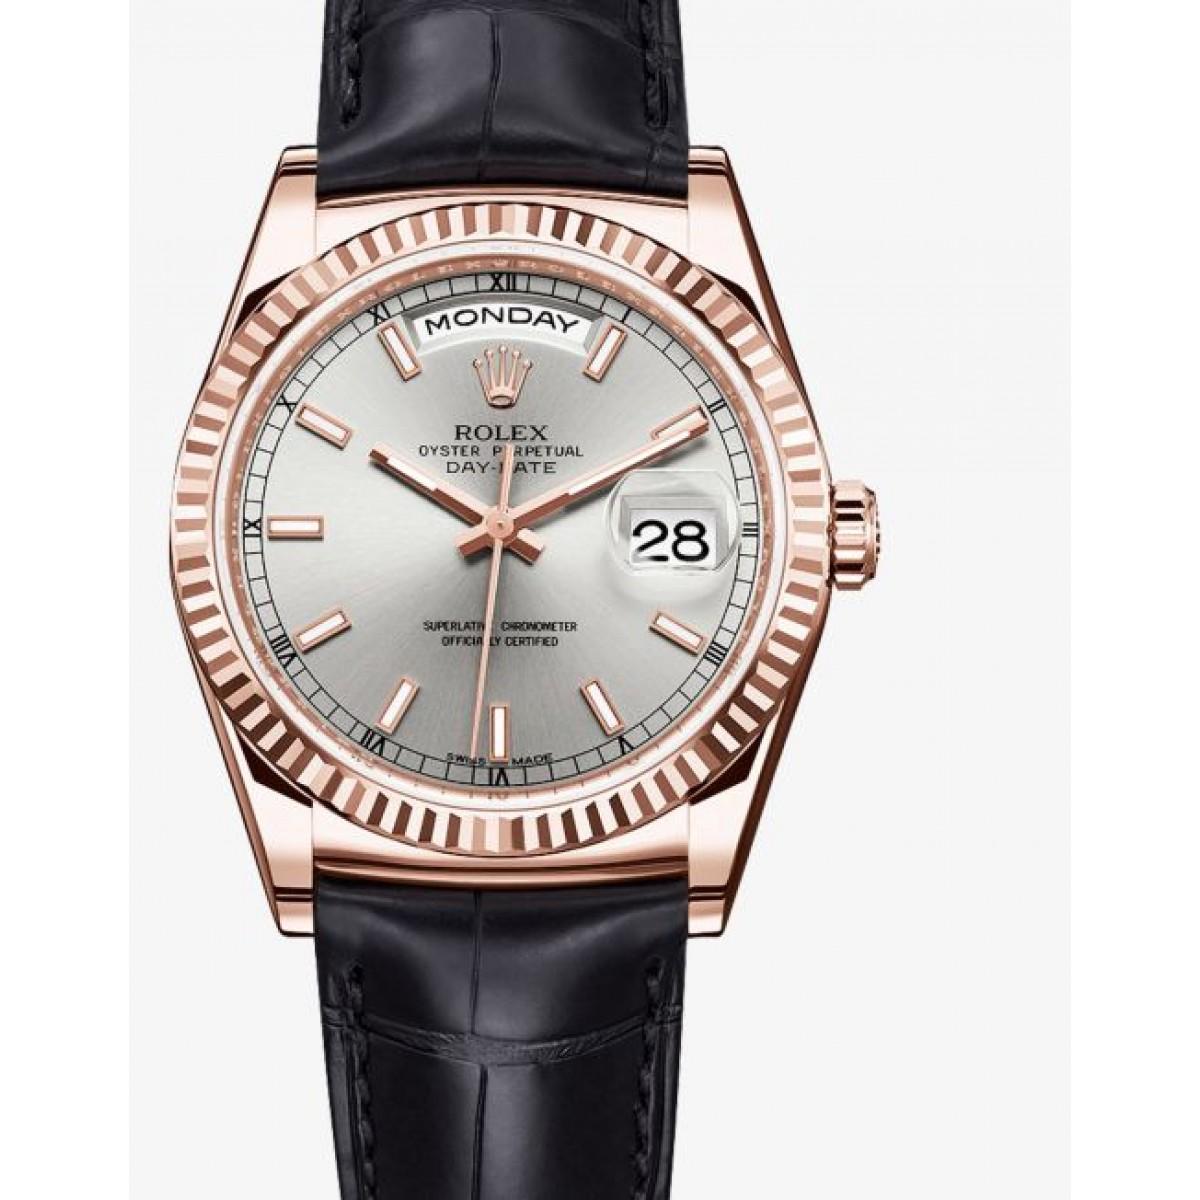 996e839a2b2 Relógio Réplica Rolex Day Date Black Gold White